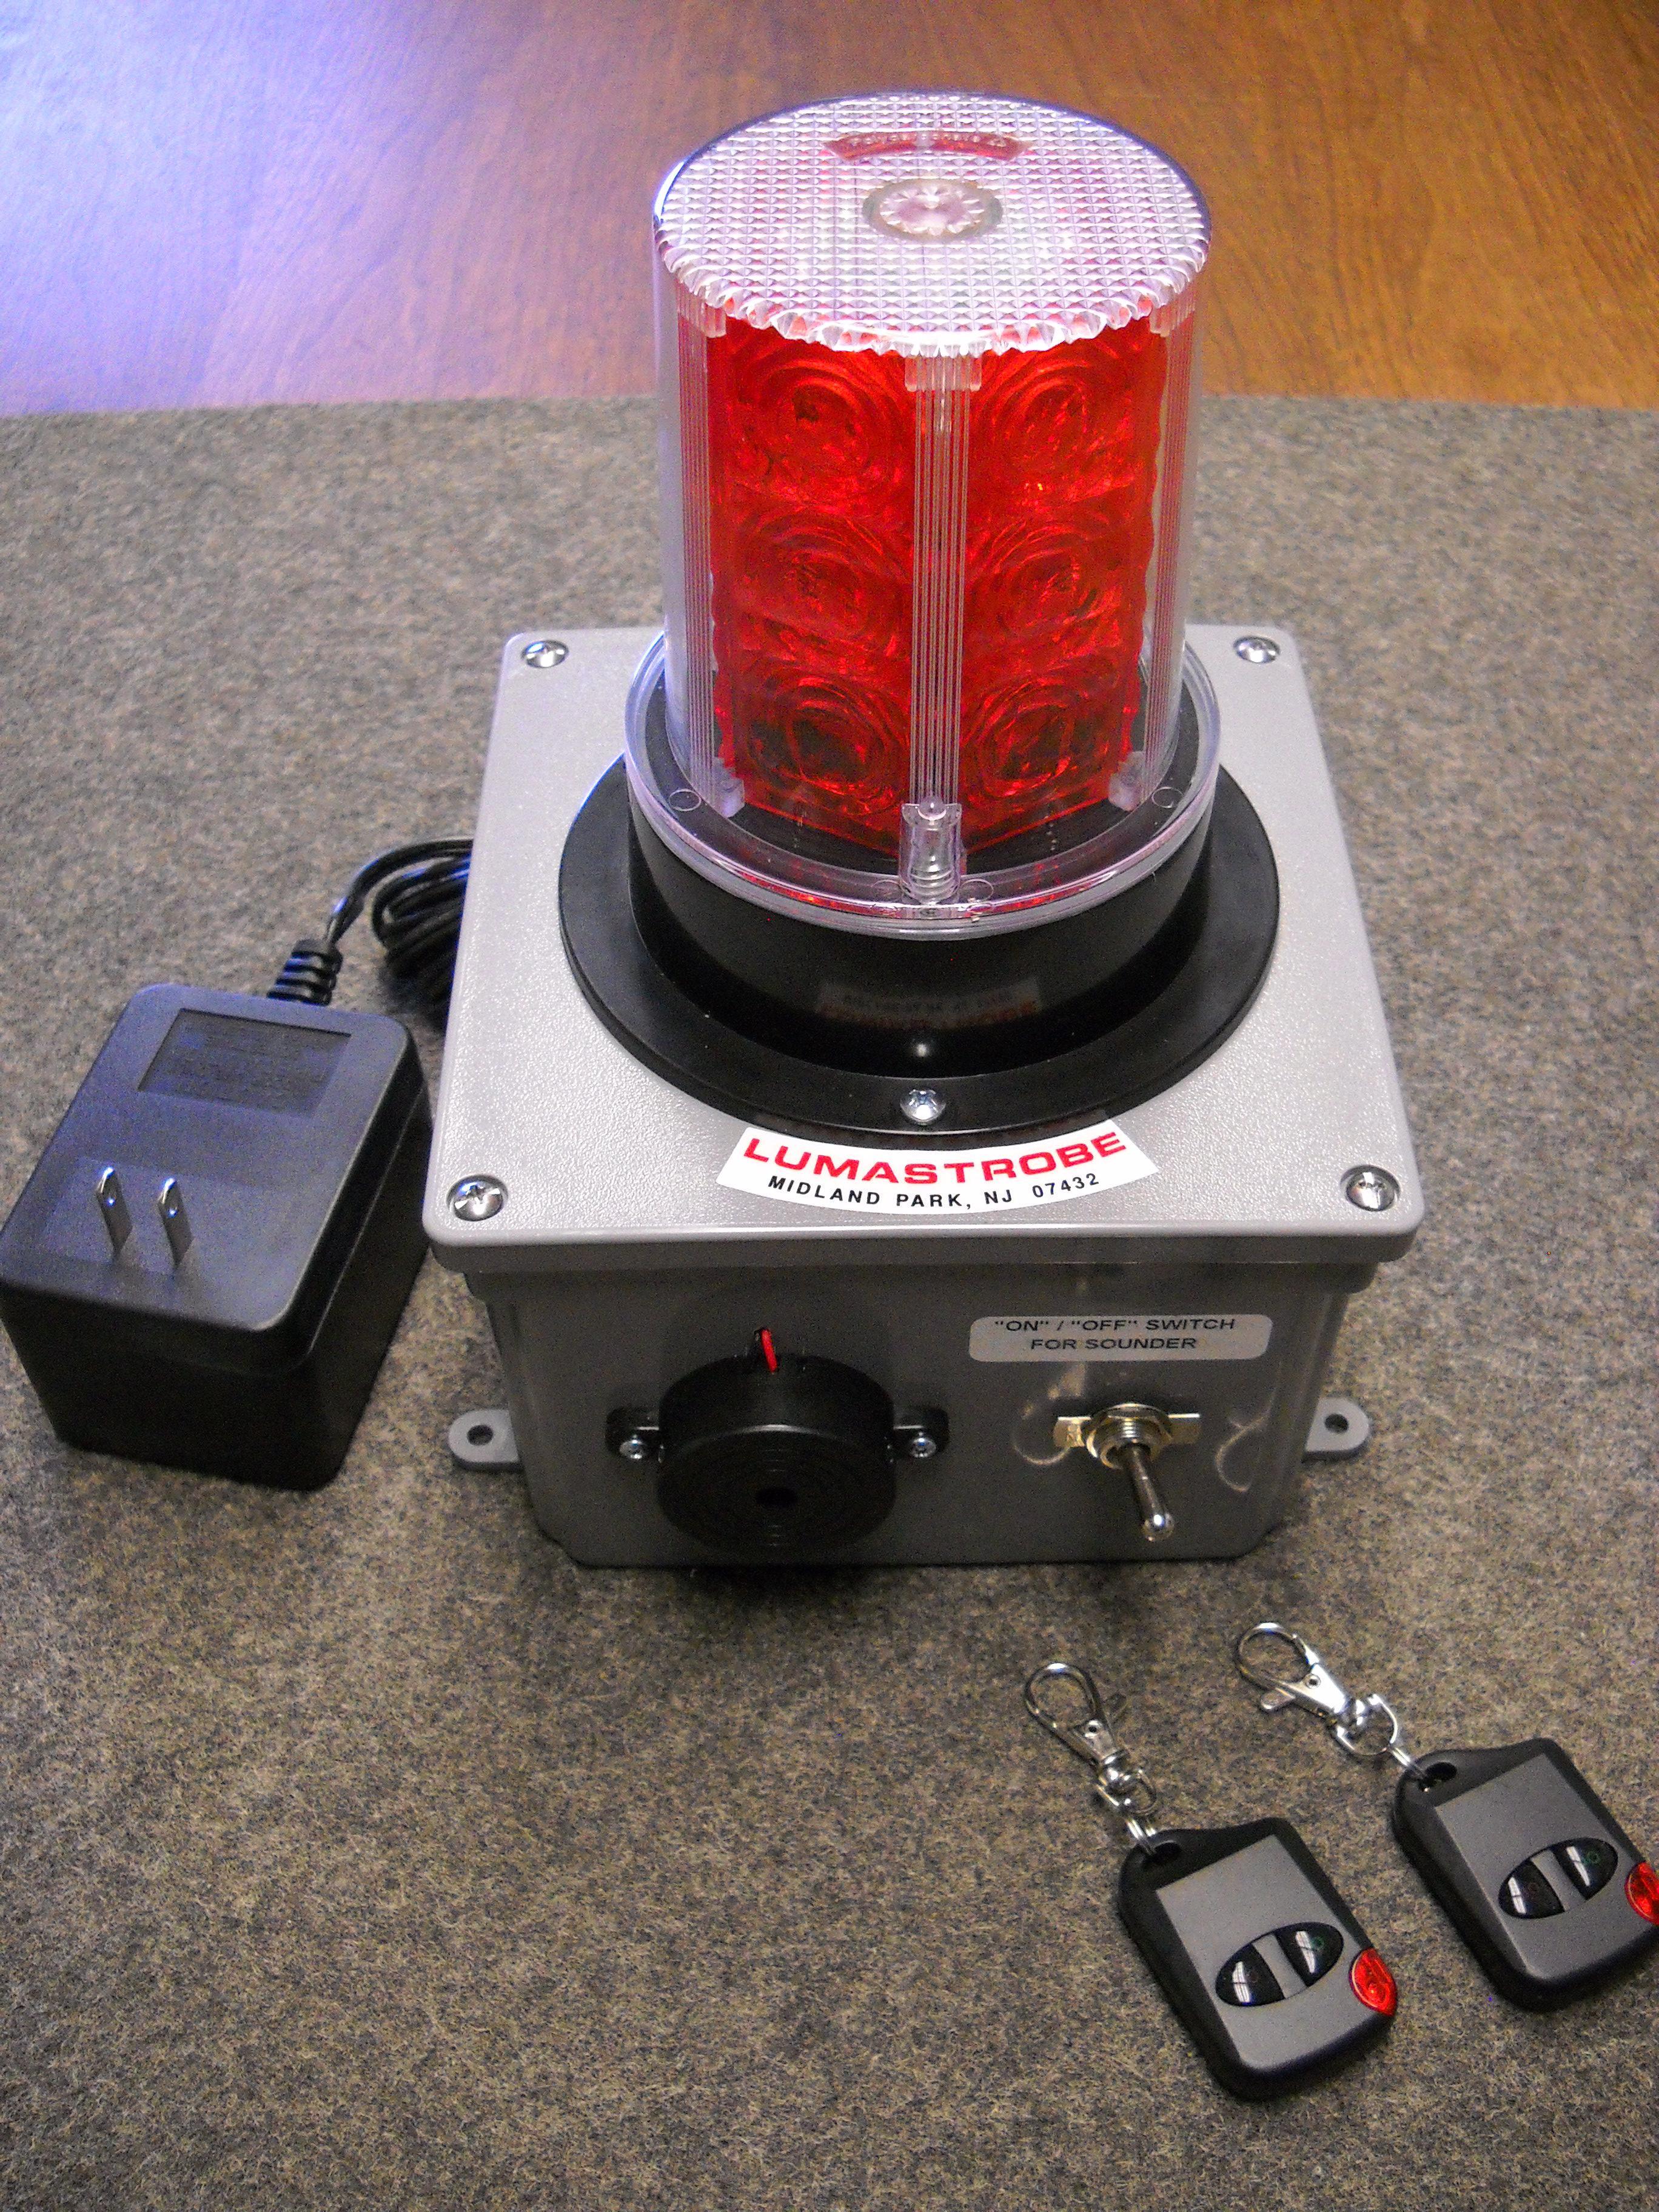 Rclx 36 120 Buzz Flasher And Audible Alarm